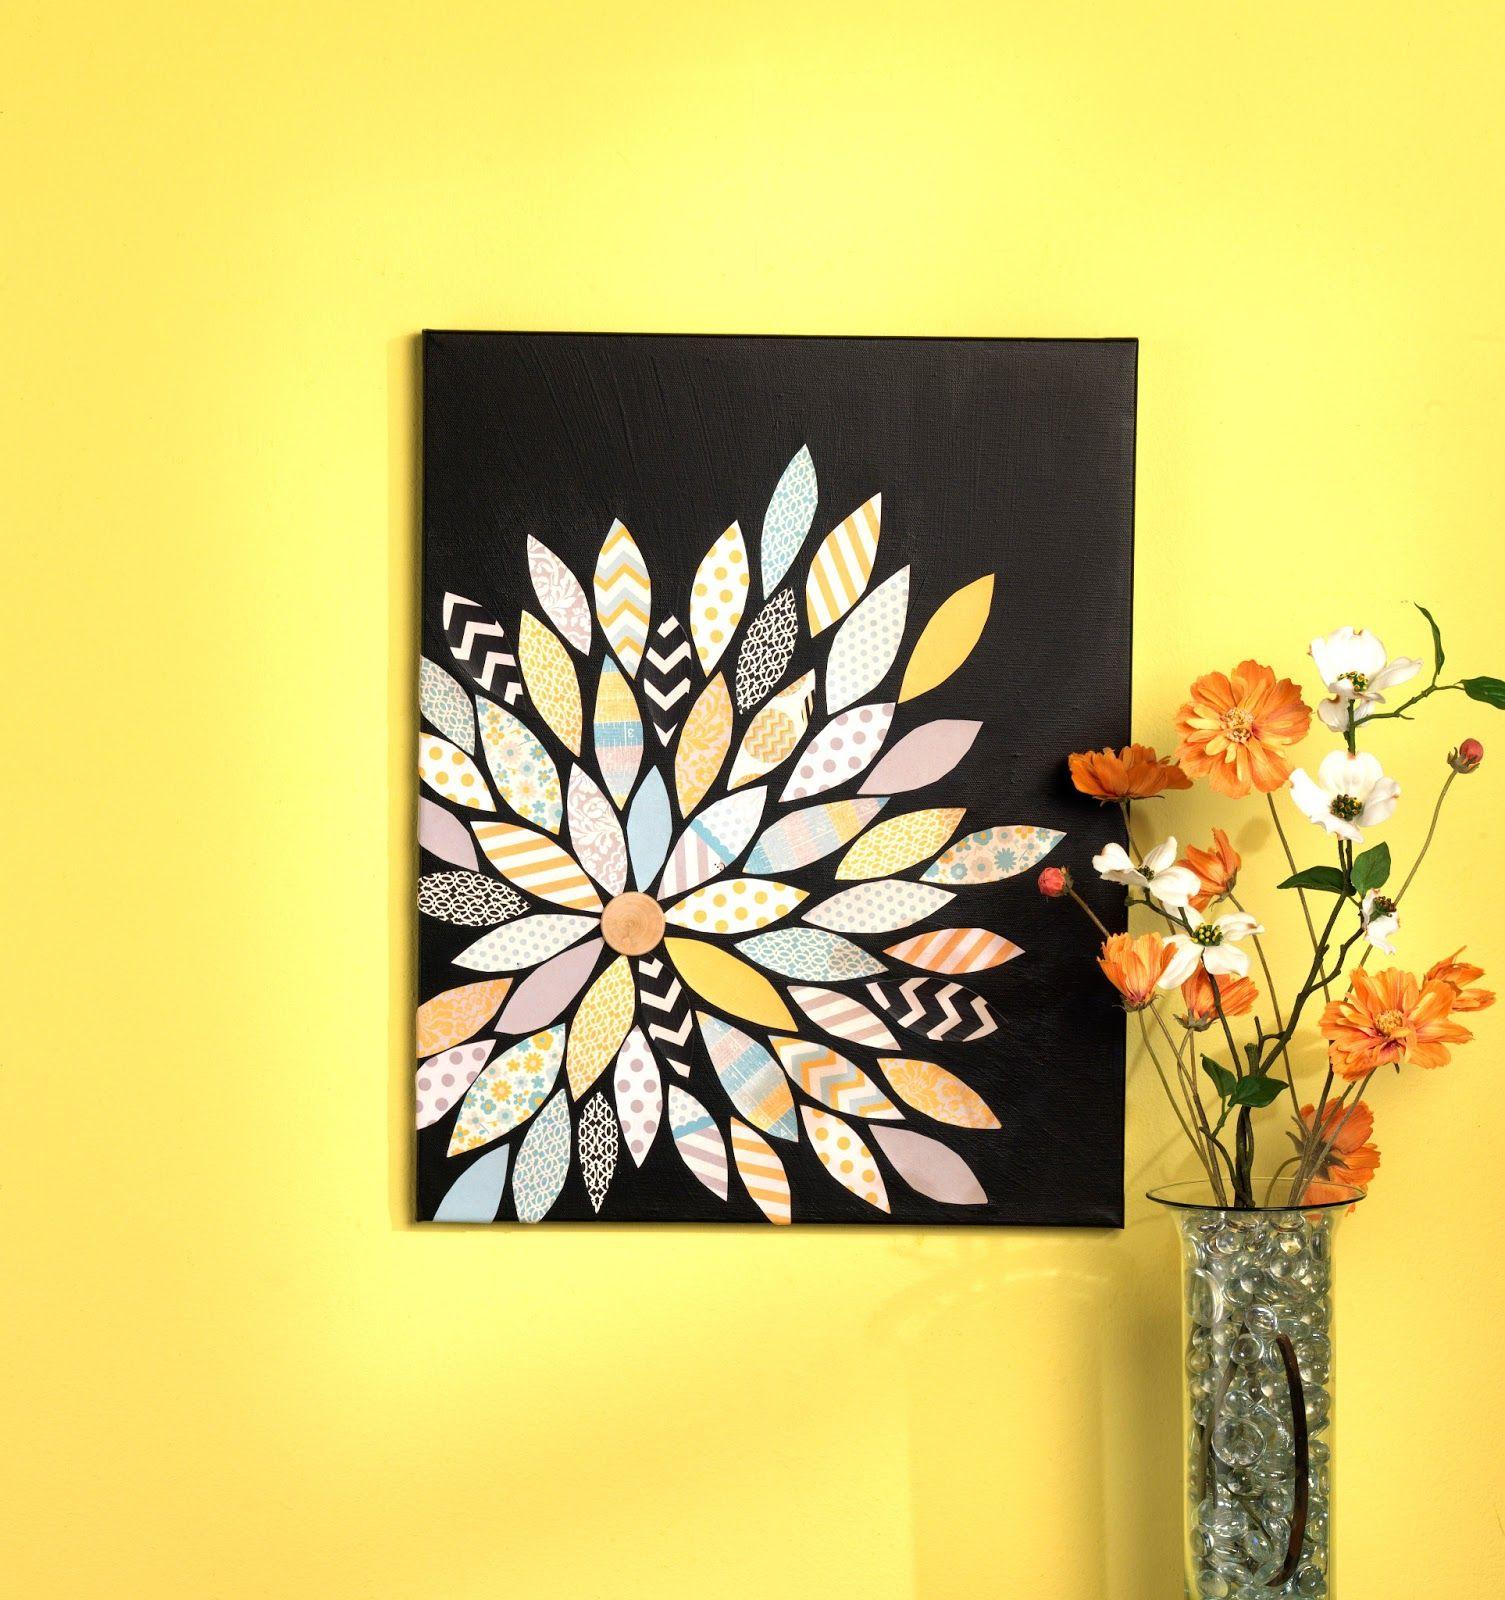 Scrapbook Paper Pieced Flower DIY Canvas Art Diy canvas